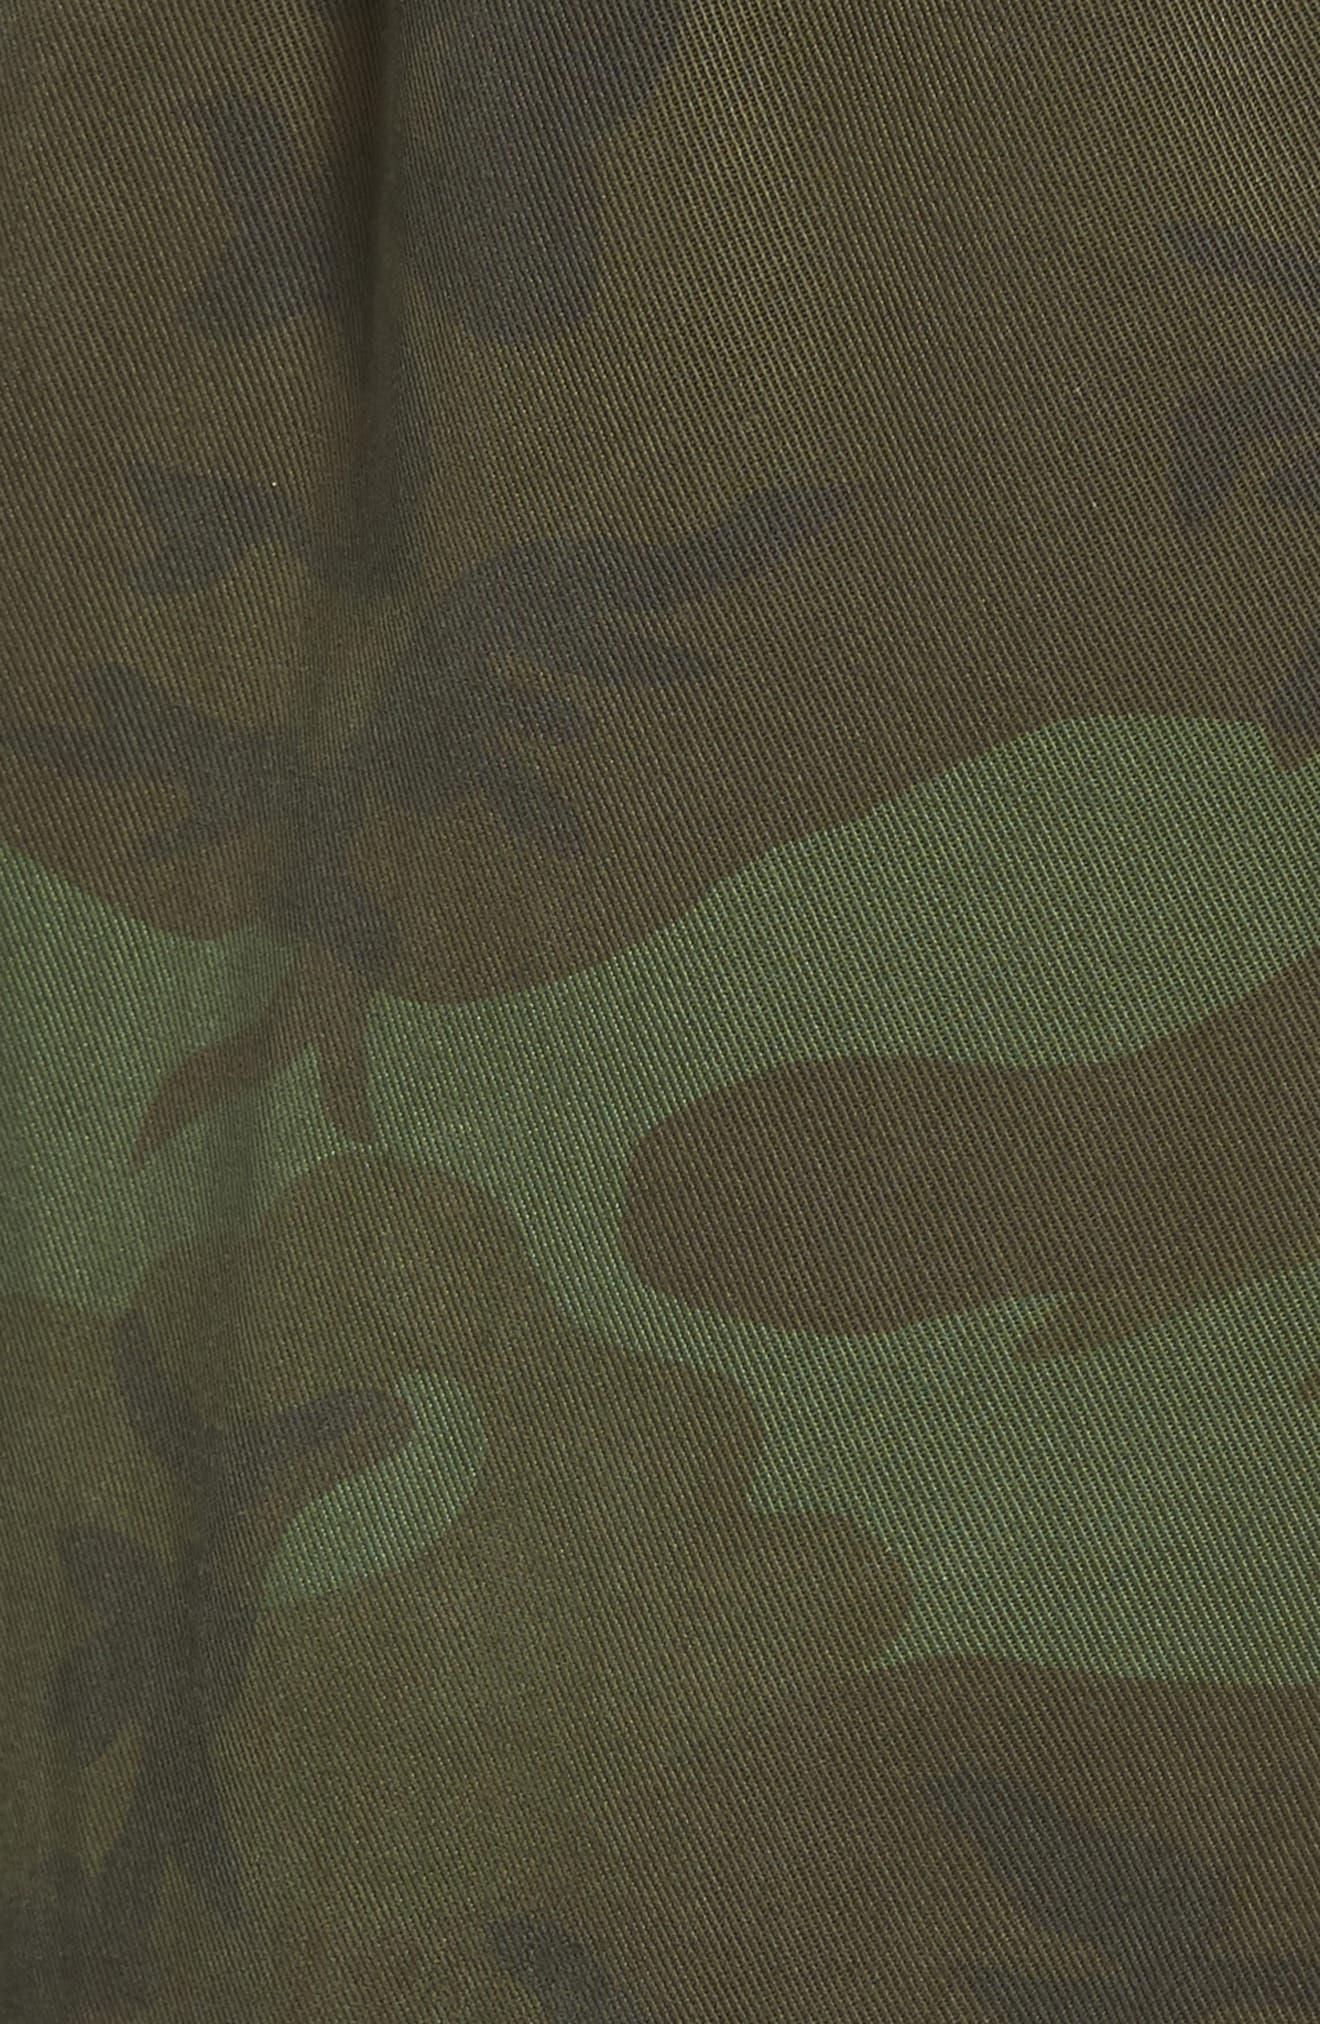 Camo Utility Pants,                             Alternate thumbnail 5, color,                             371